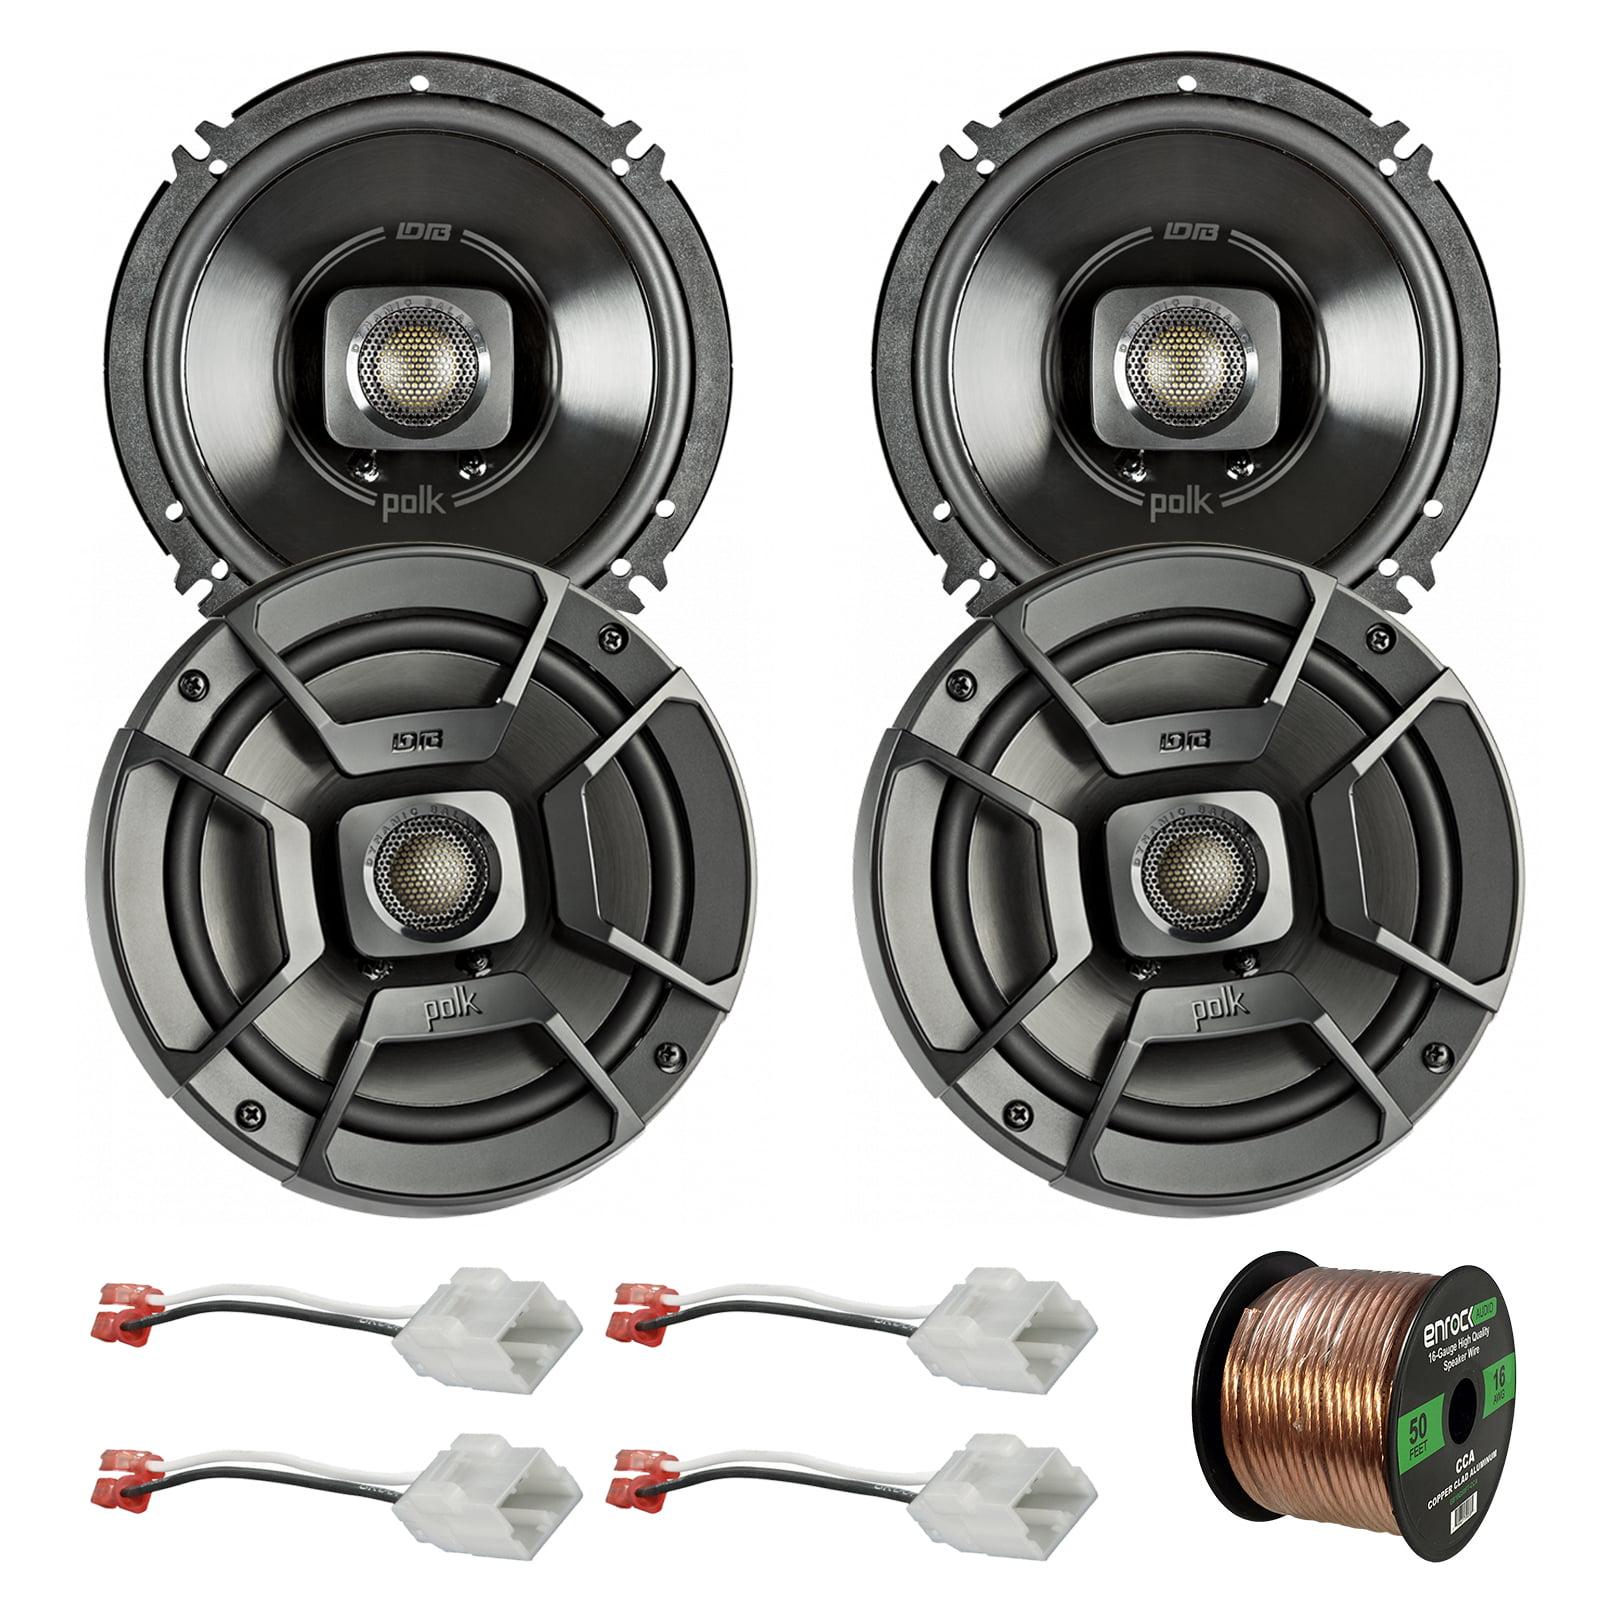 "4x Polk Audio 6.5"" 300W 2 Way Car/Marine ATV Stereo Coaxial Speakers DB652, 4x Metra 72-6514 Speaker Harness for Select Chrysler/Dodge Vehicles, Enrock Audio 16-Gauge 50 Foot Speaker Wire"